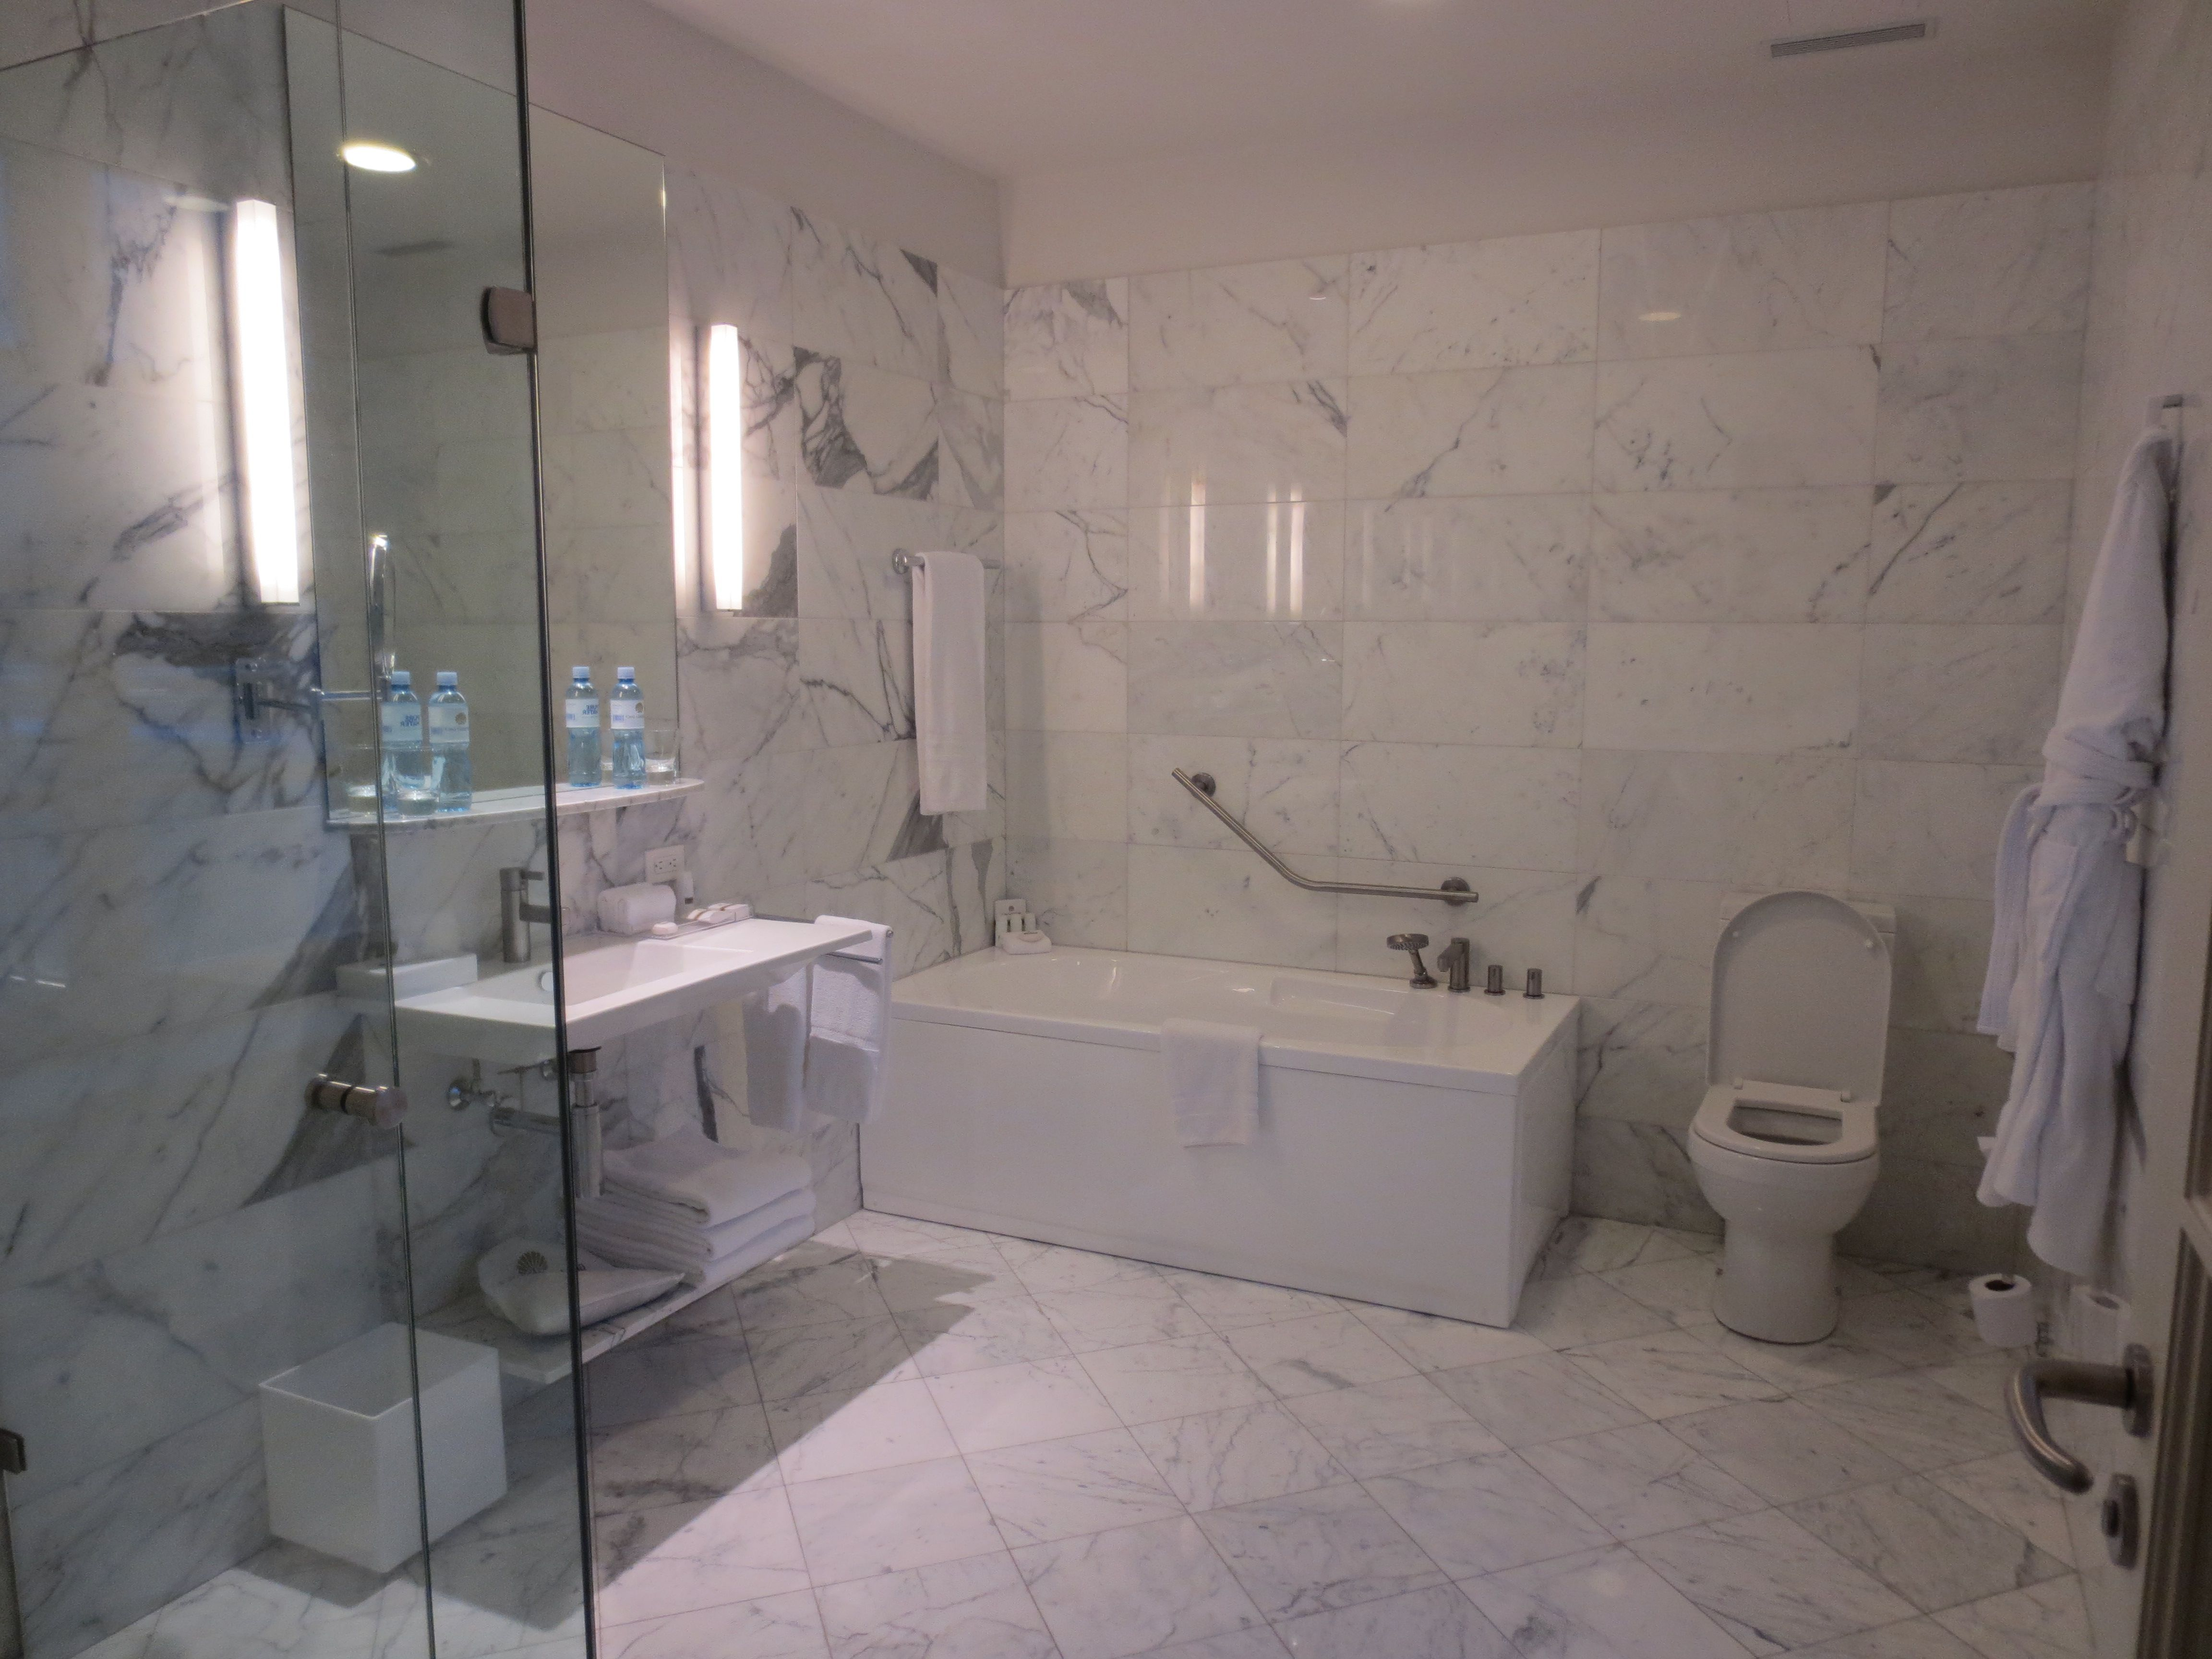 A washroom fit for a king ecuador vm trufflepig for Washroom photo